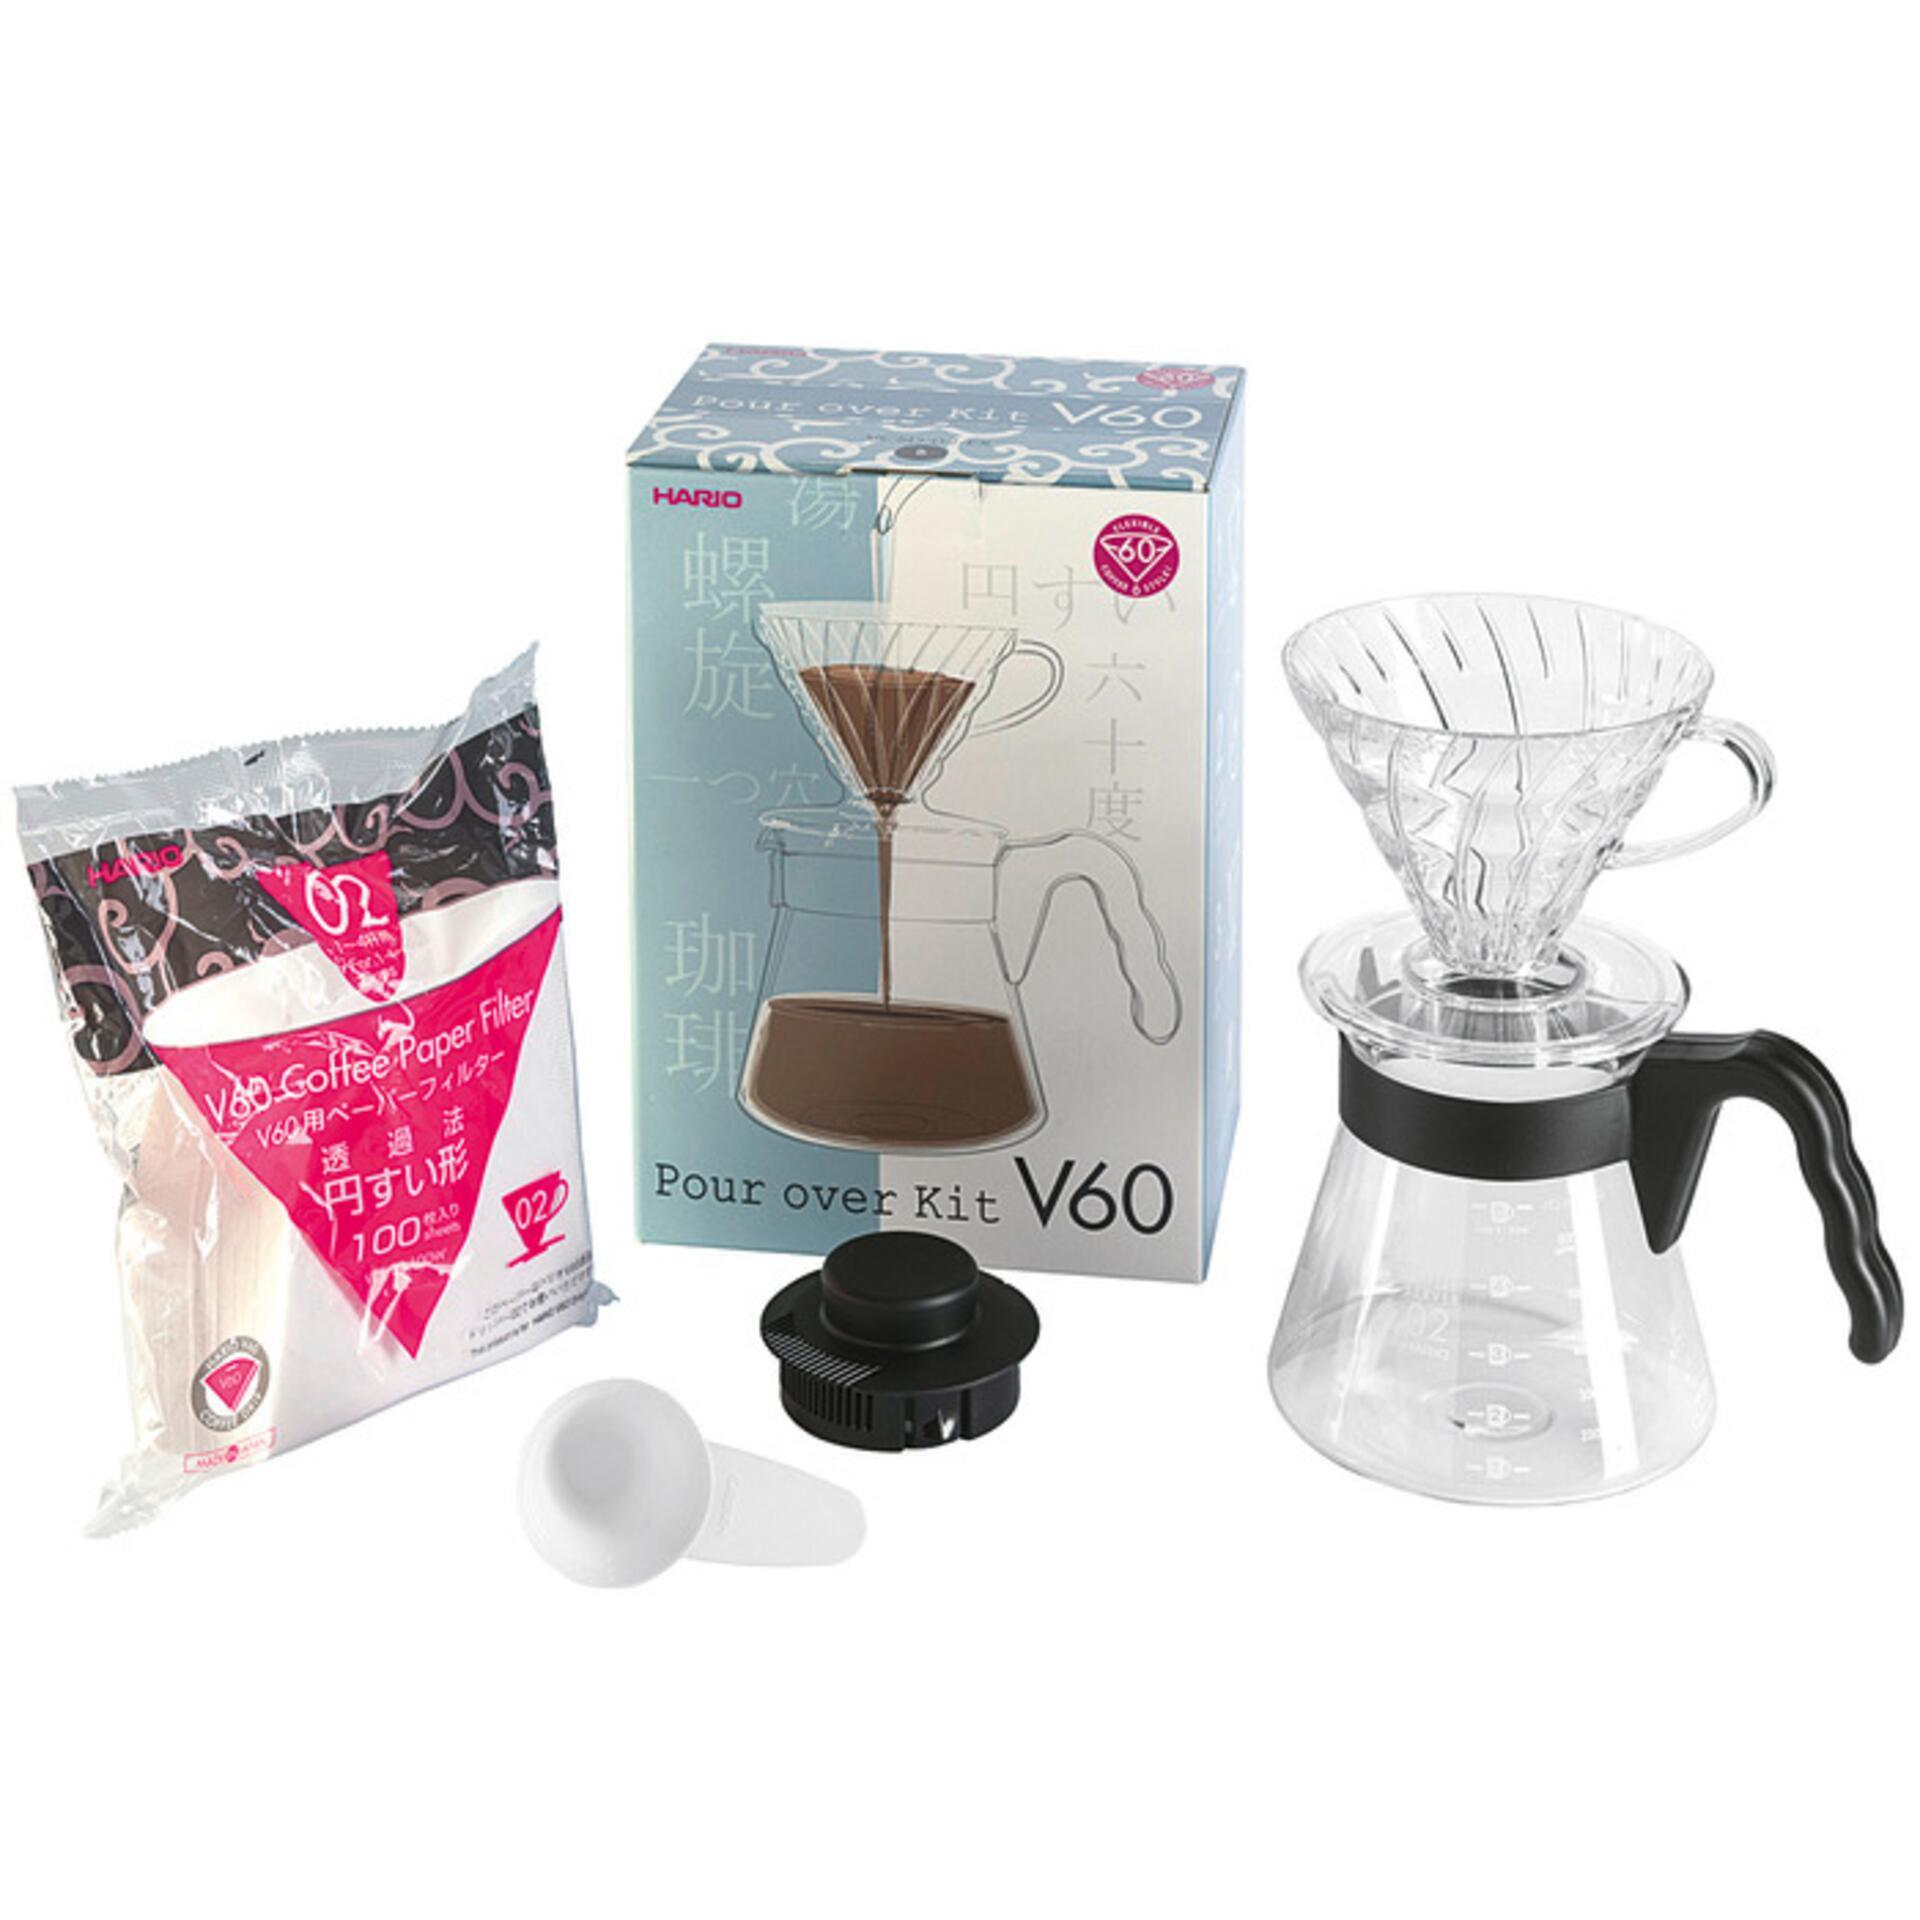 Hario Einsteigerset Kaffee V60 4teilig